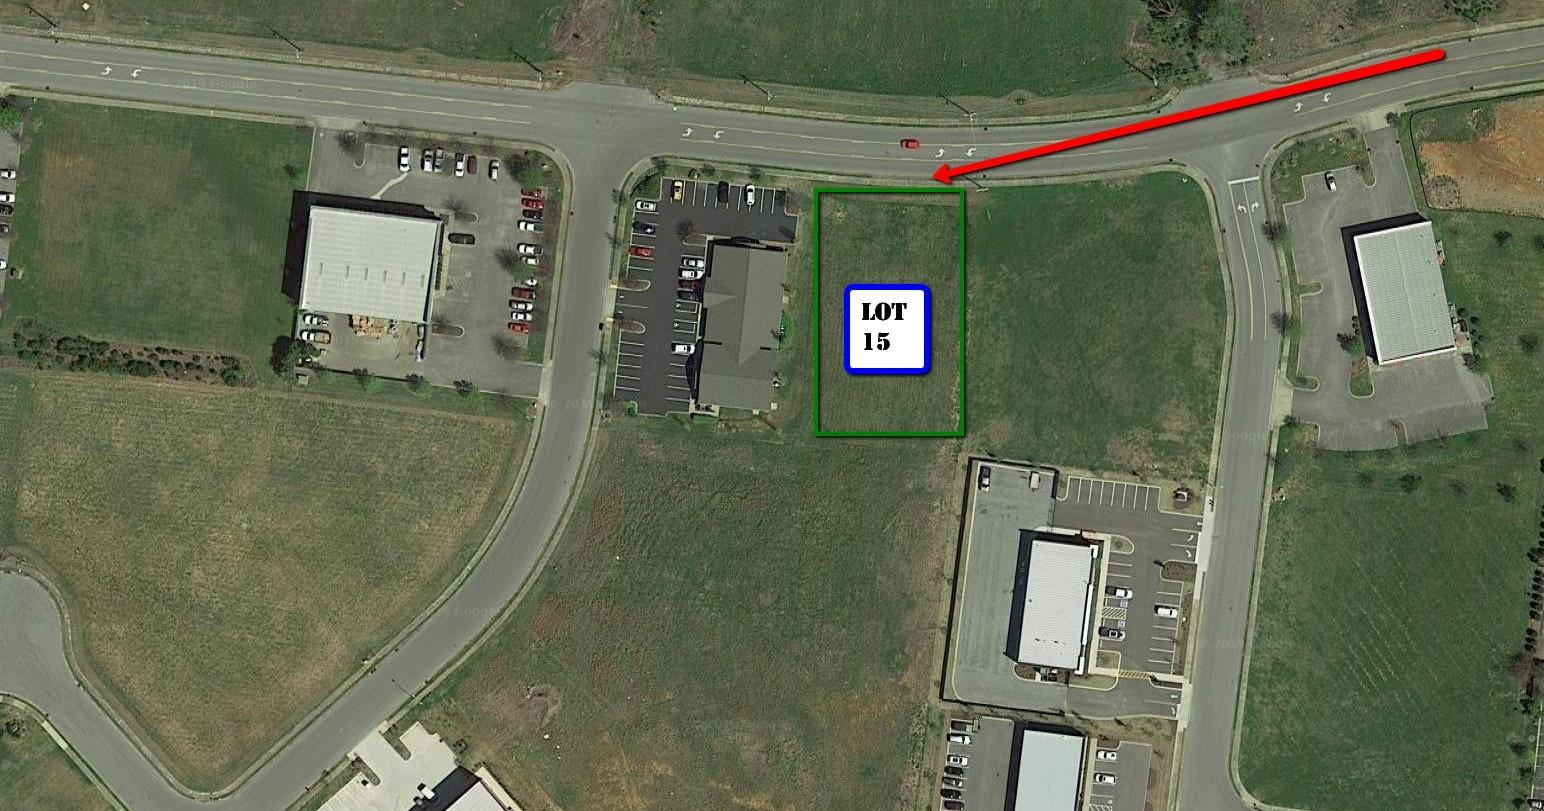 231 W Rutherford Blvd Property Photo - Murfreesboro, TN real estate listing